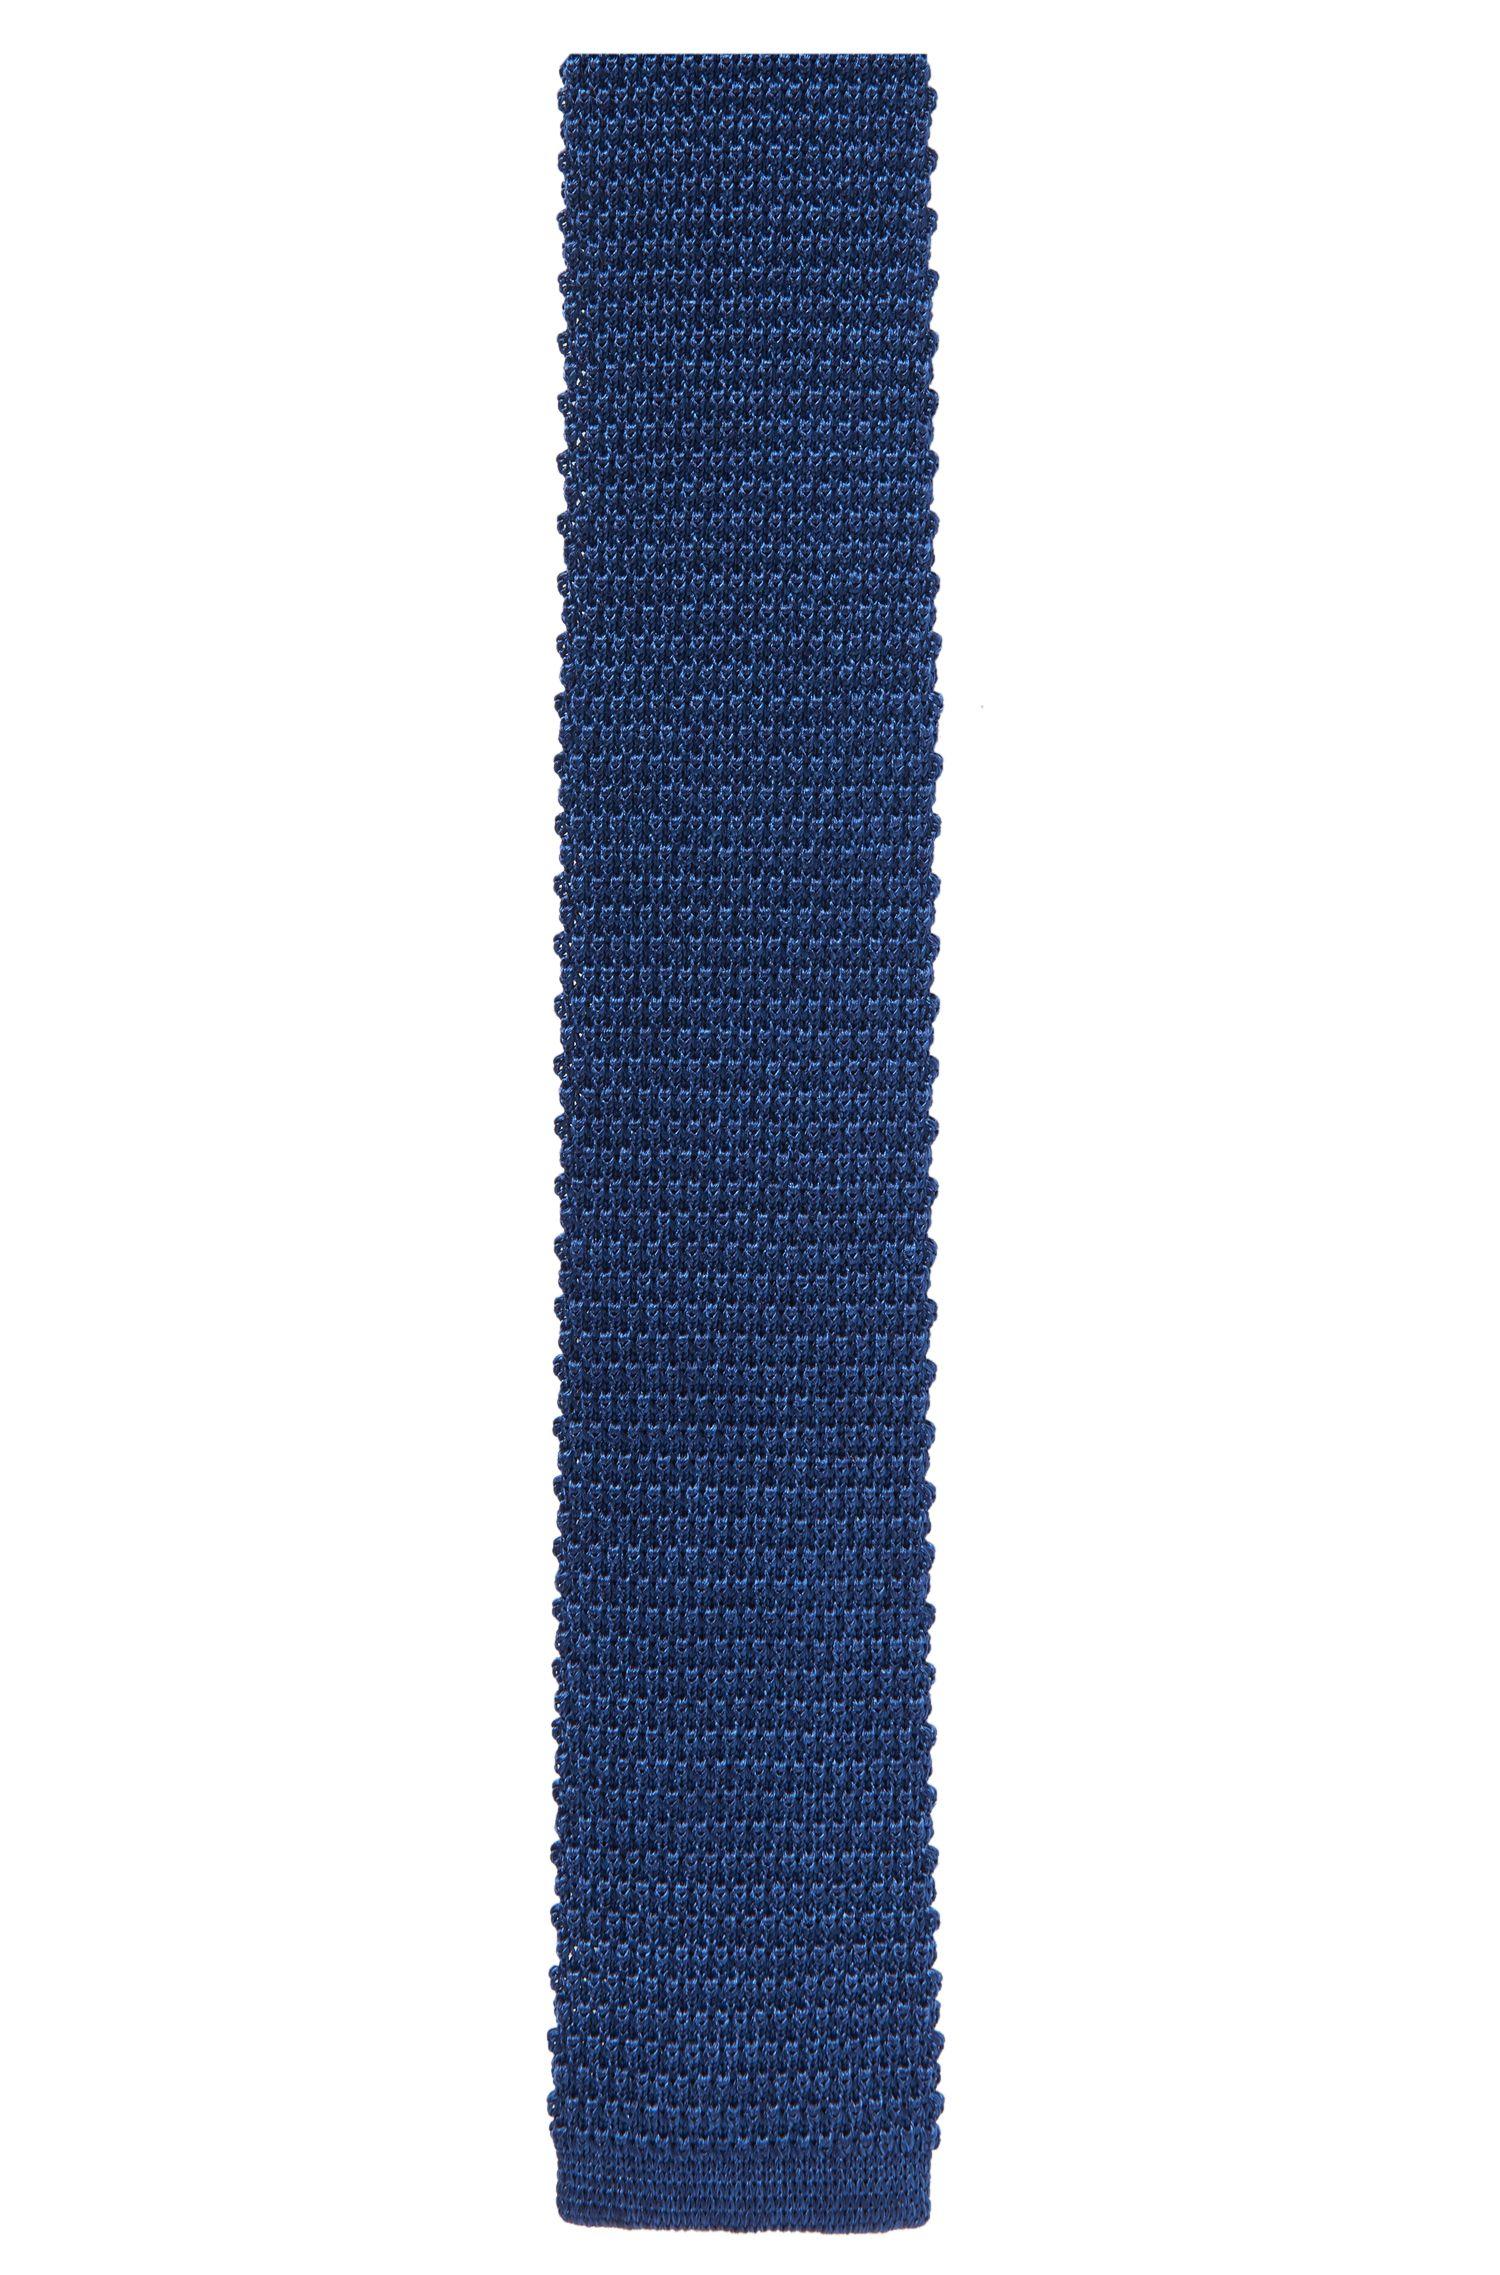 'Tie 5 cm' | Skinny, Italian Silk Pique Knit Tie